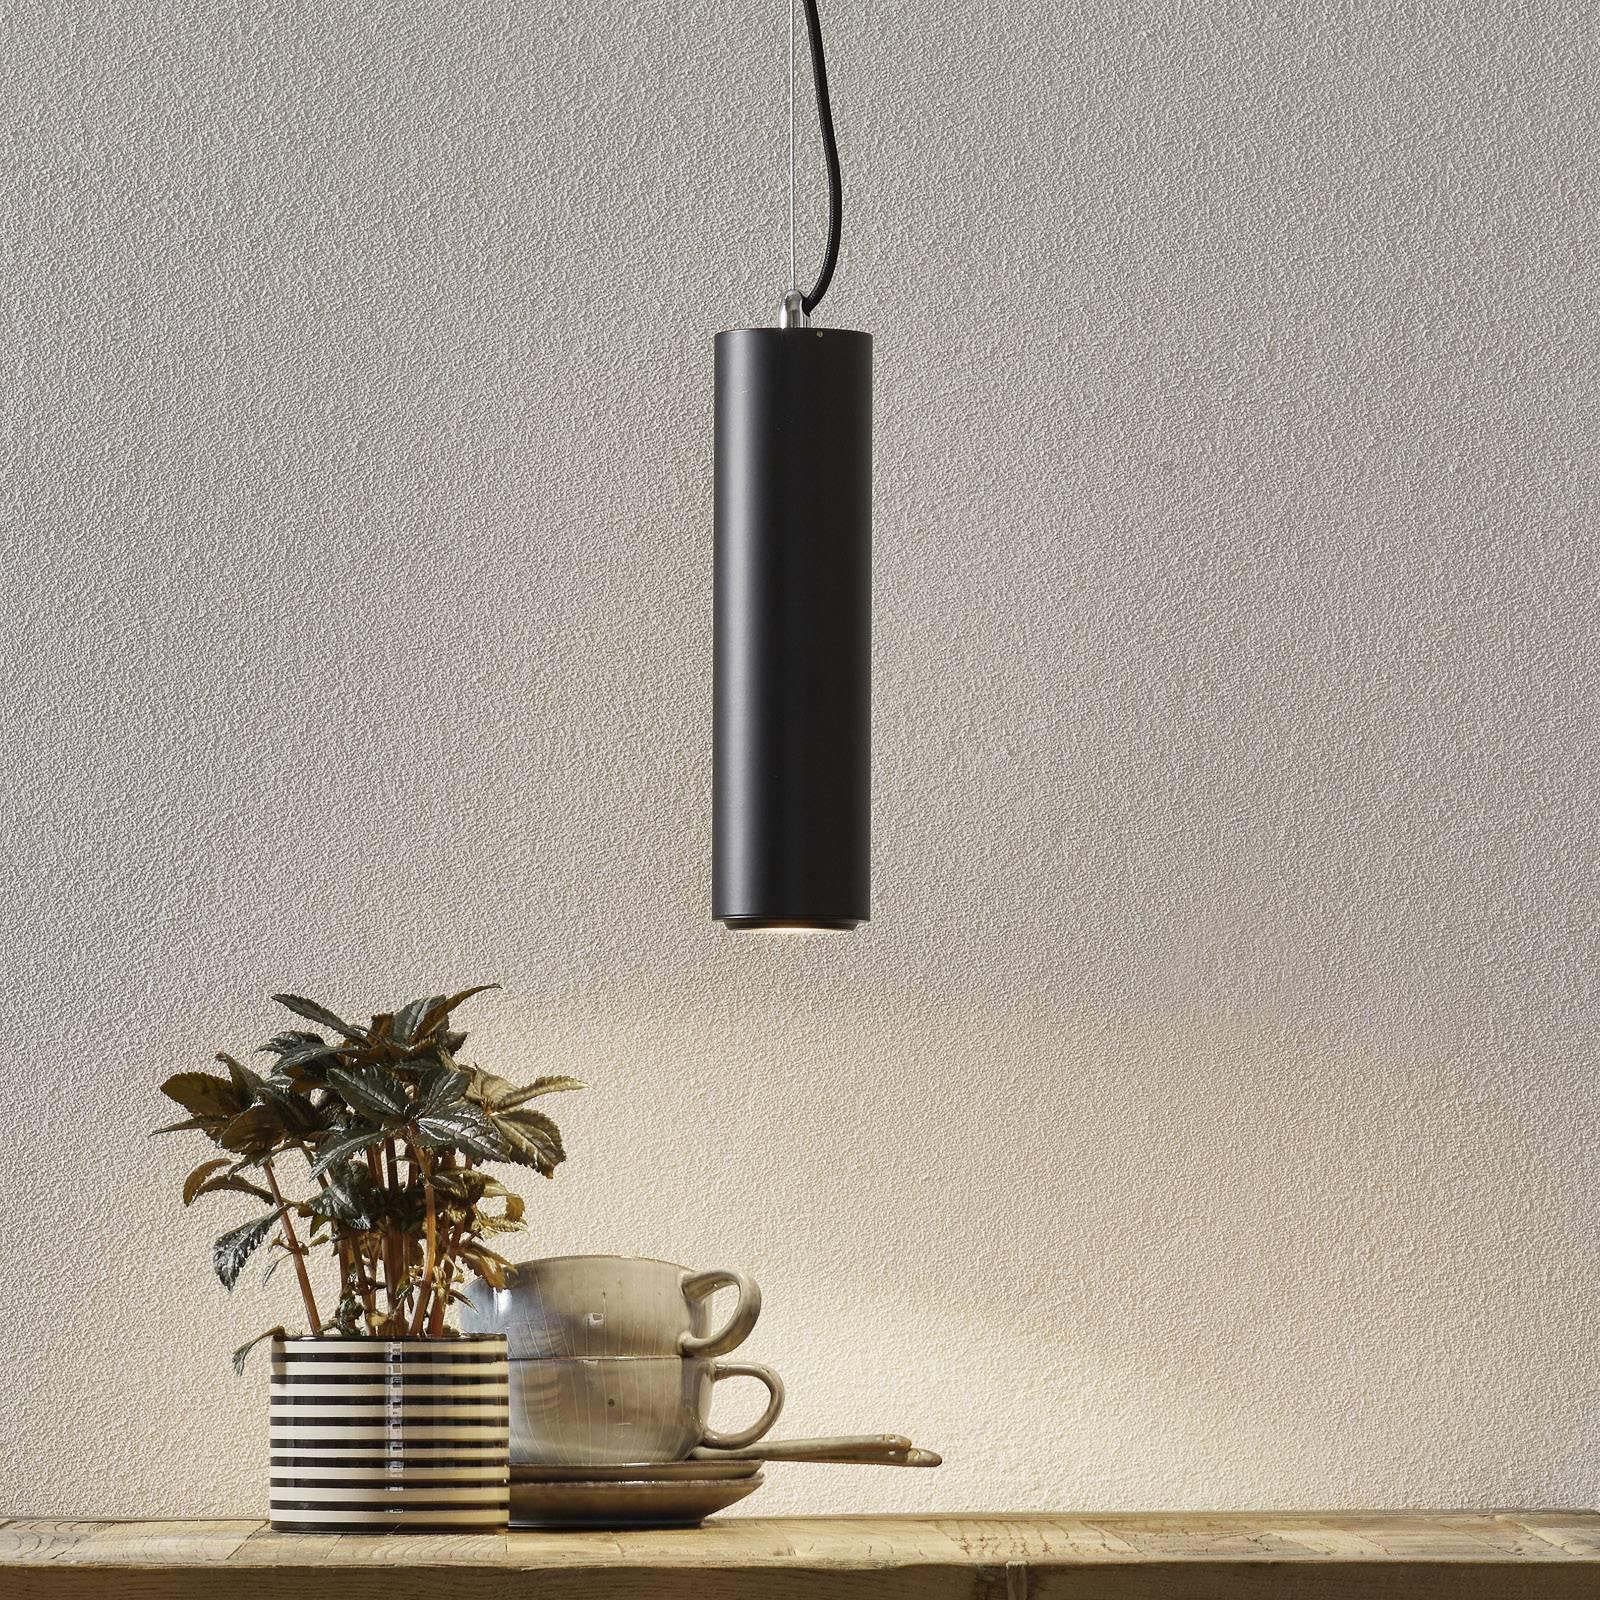 Studio - svart LED-pendellampe i sylinderform